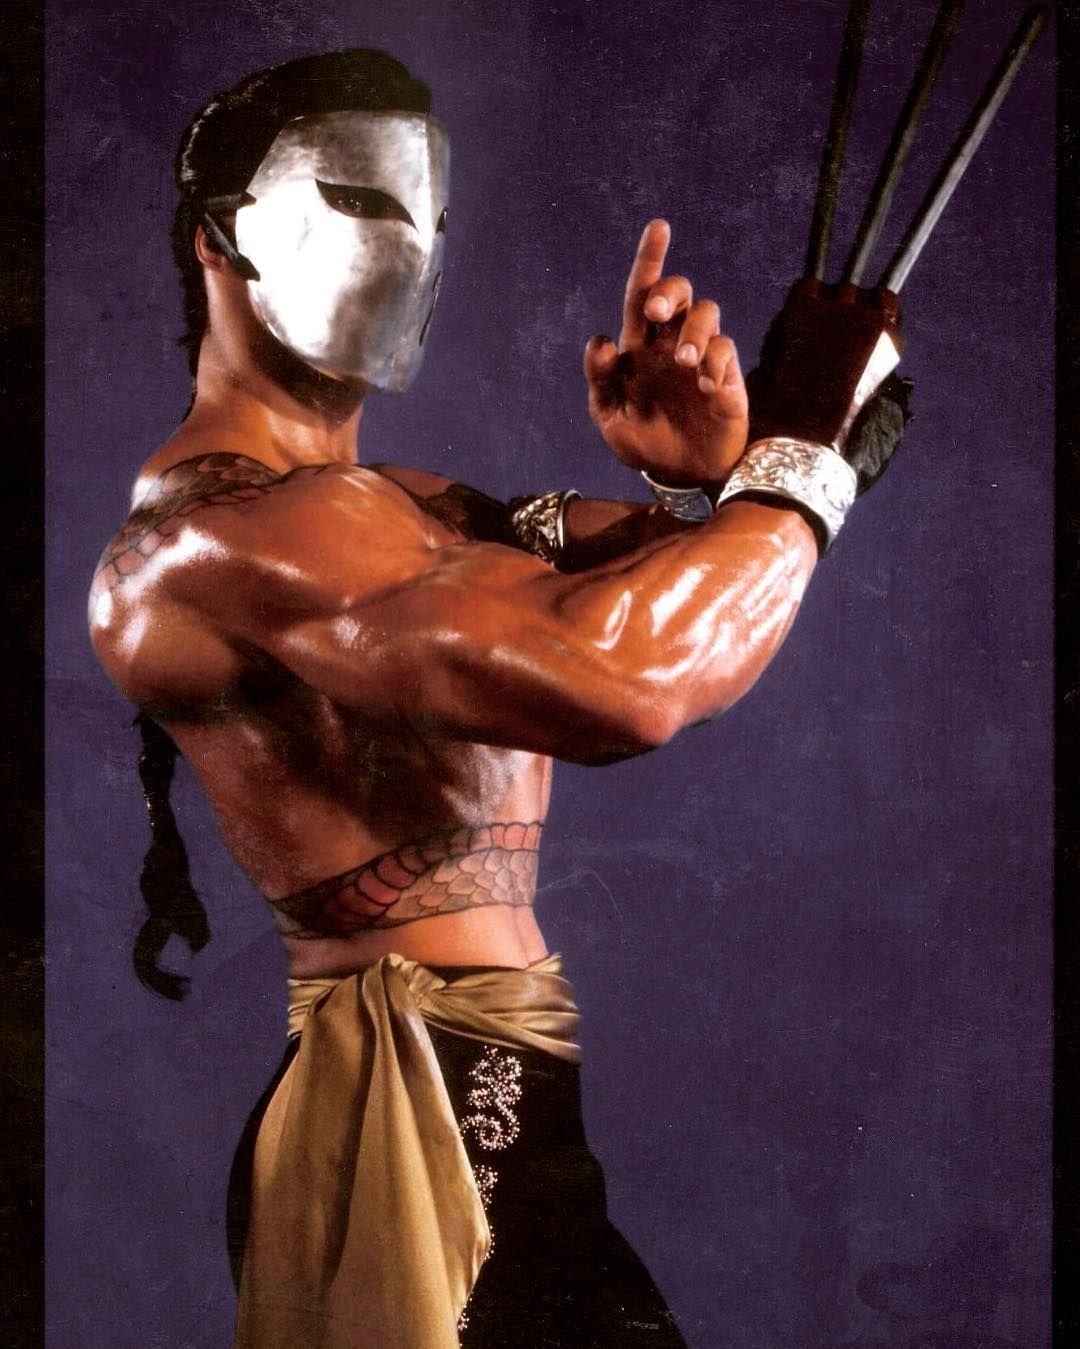 Vegas Was The Original Cage Fighter Before Mma Jay Tavare Statue Greek Statue Jay Tavare